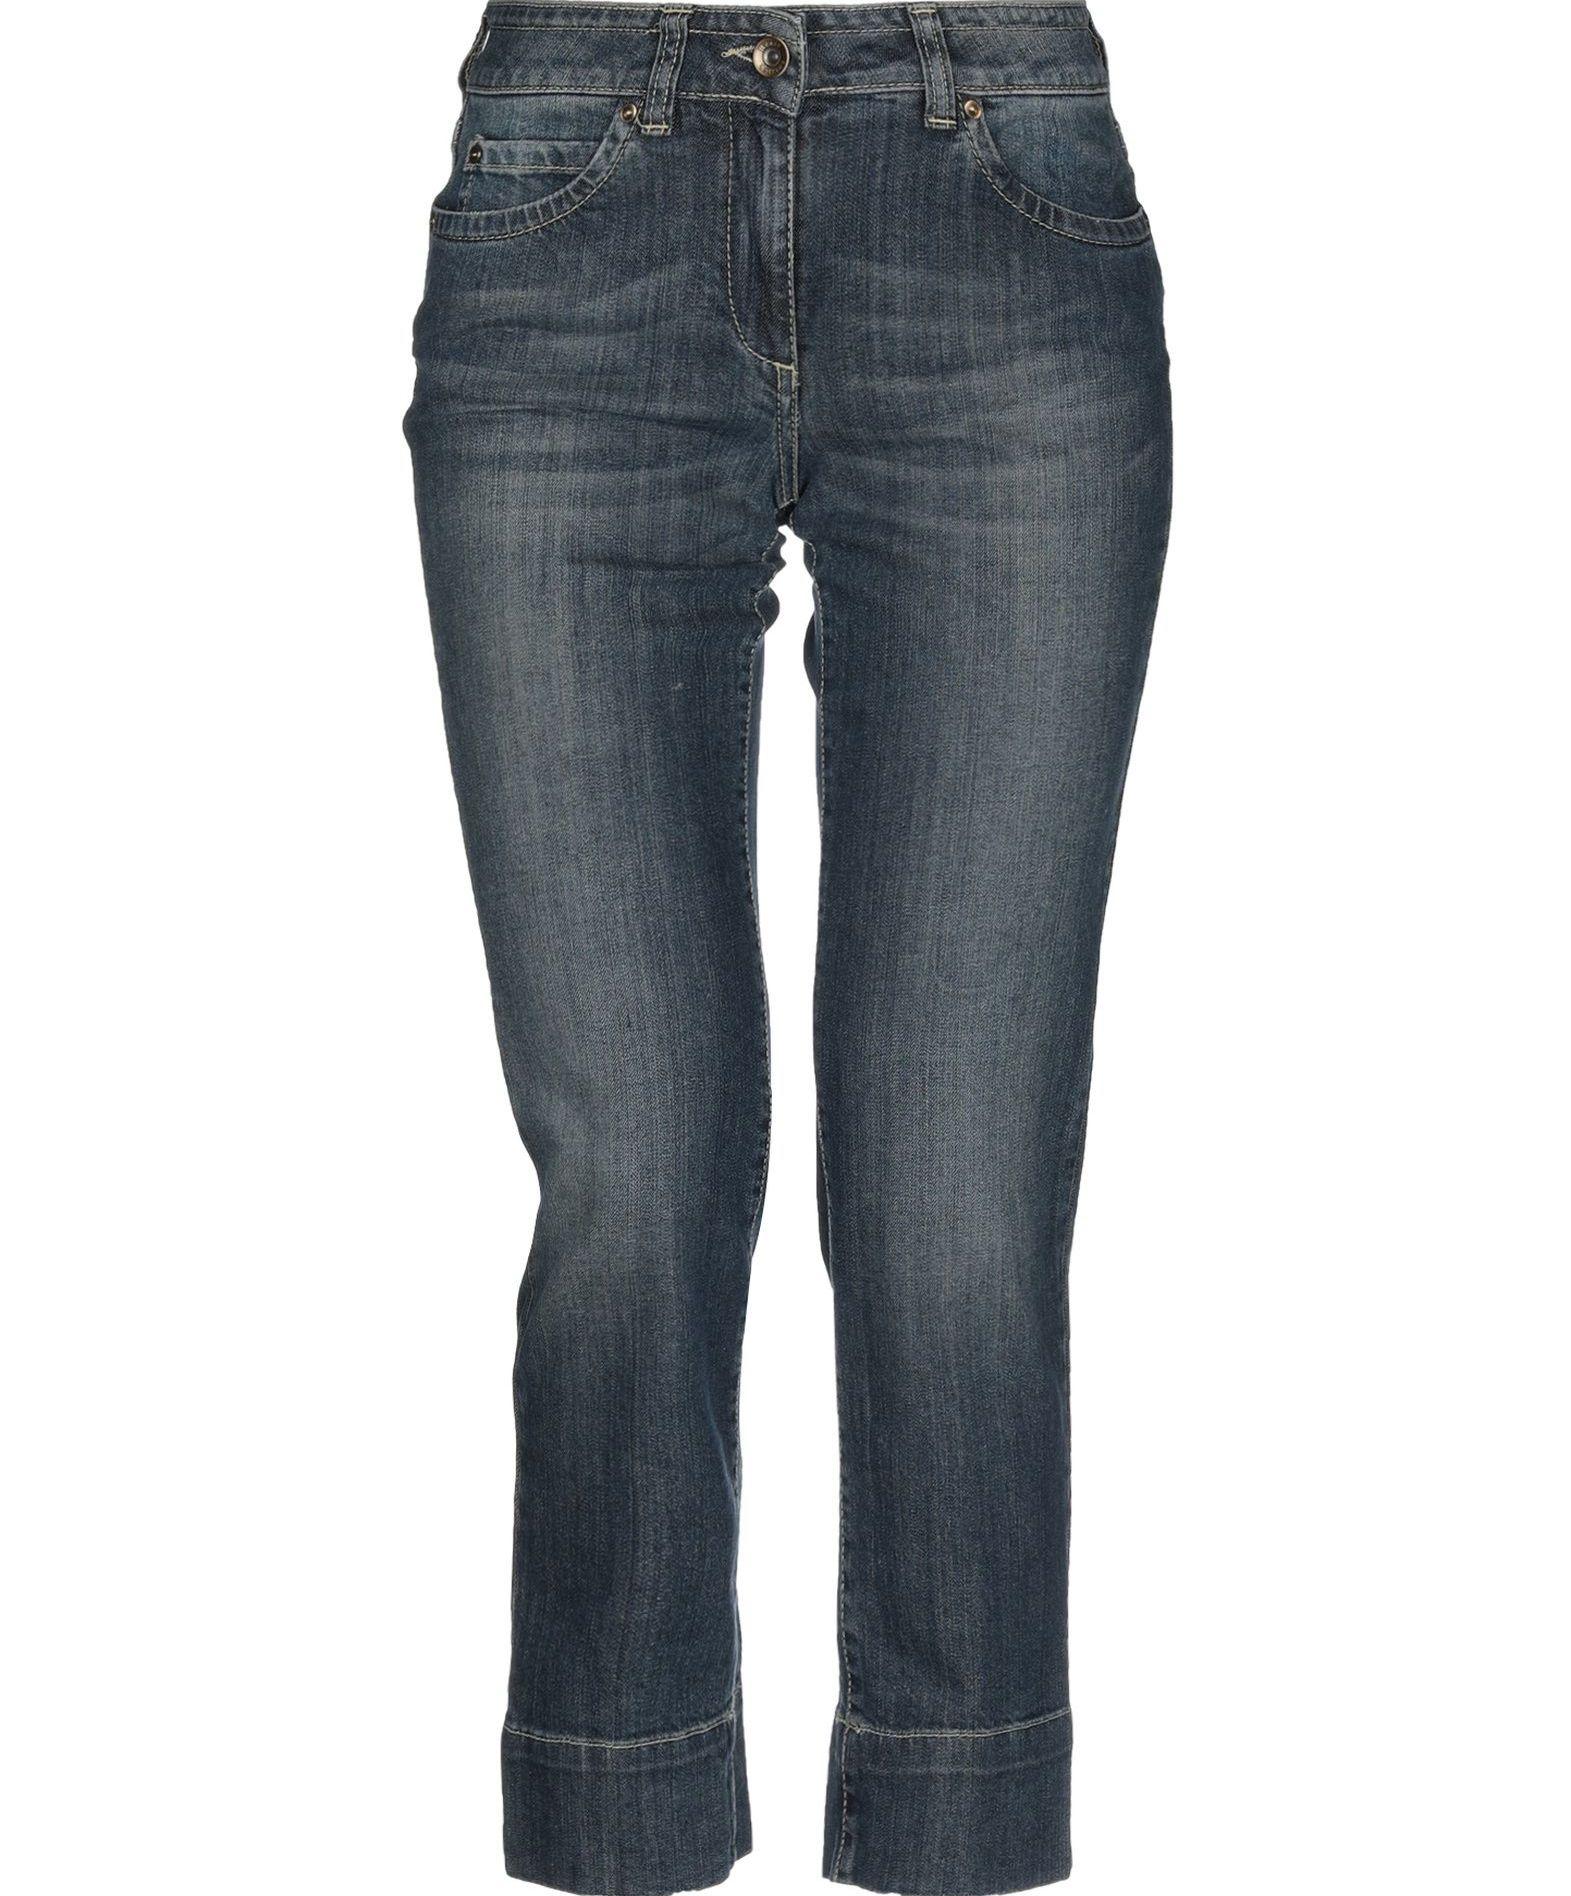 HENRY COTTON'S DENIM Denim παντελόνια κάπρι